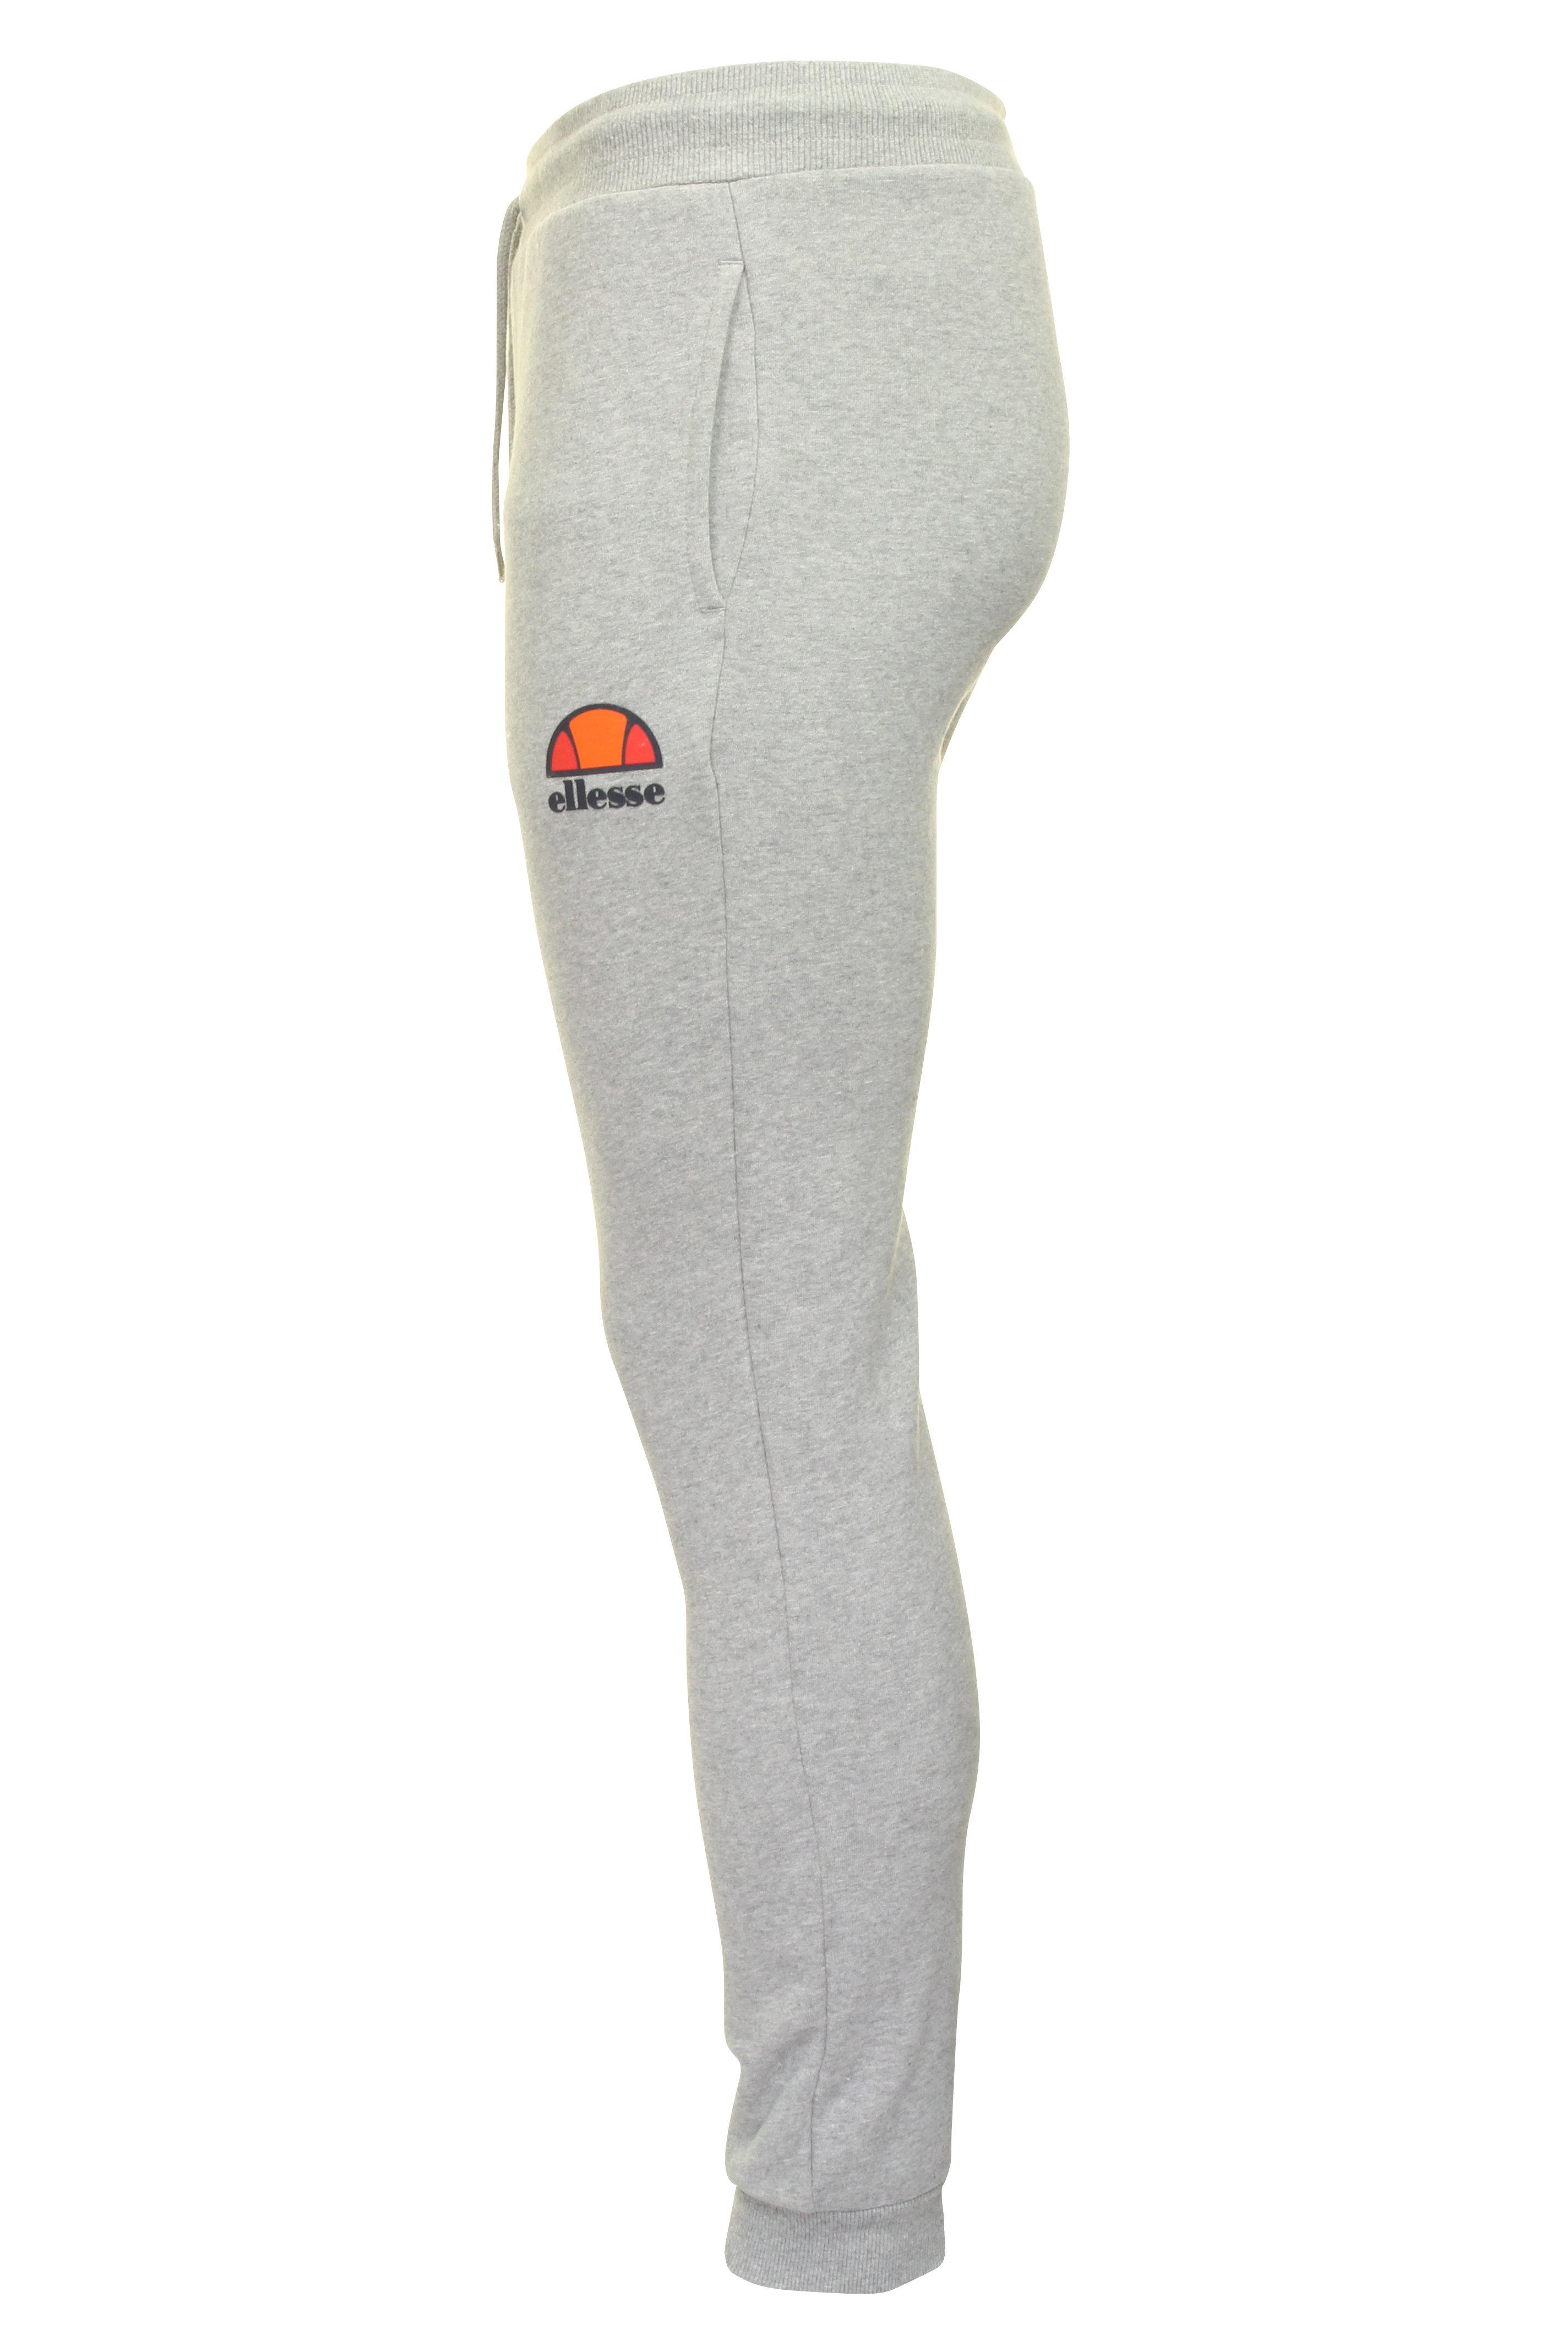 Ellesse-Da-Uomo-Pantaloni-Sportivi-Jog-Pantaloni-con-logo-034-Ovest-034 miniatura 10